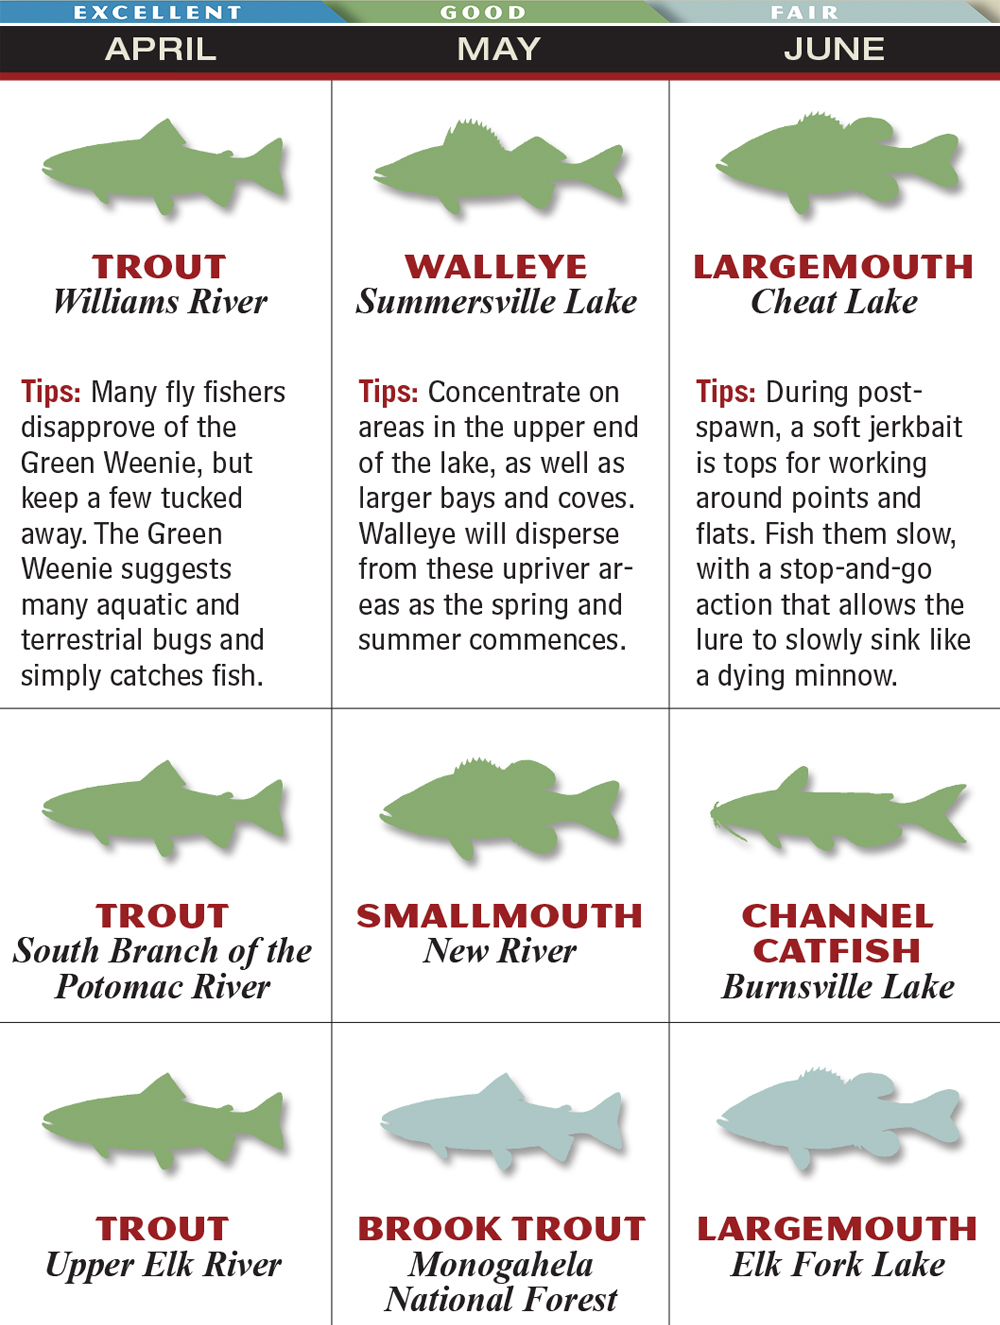 Freshwater fish maryland - May Wv Apr Jun